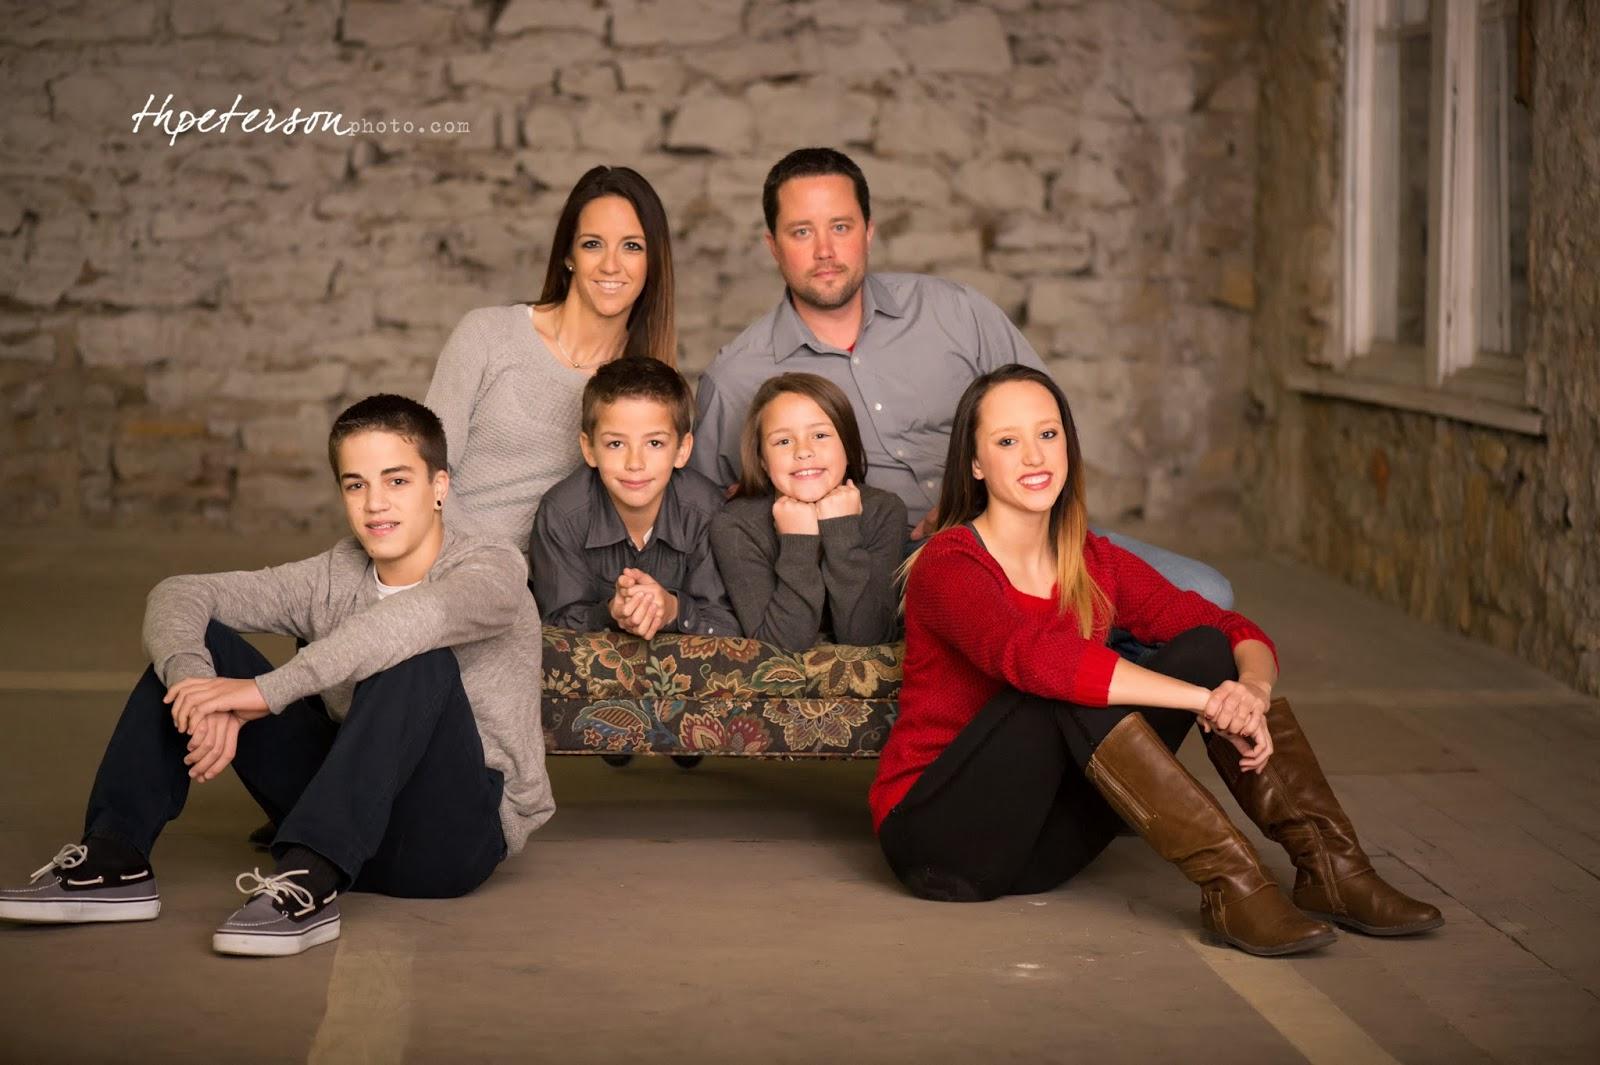 Professional Christmas Family Photos